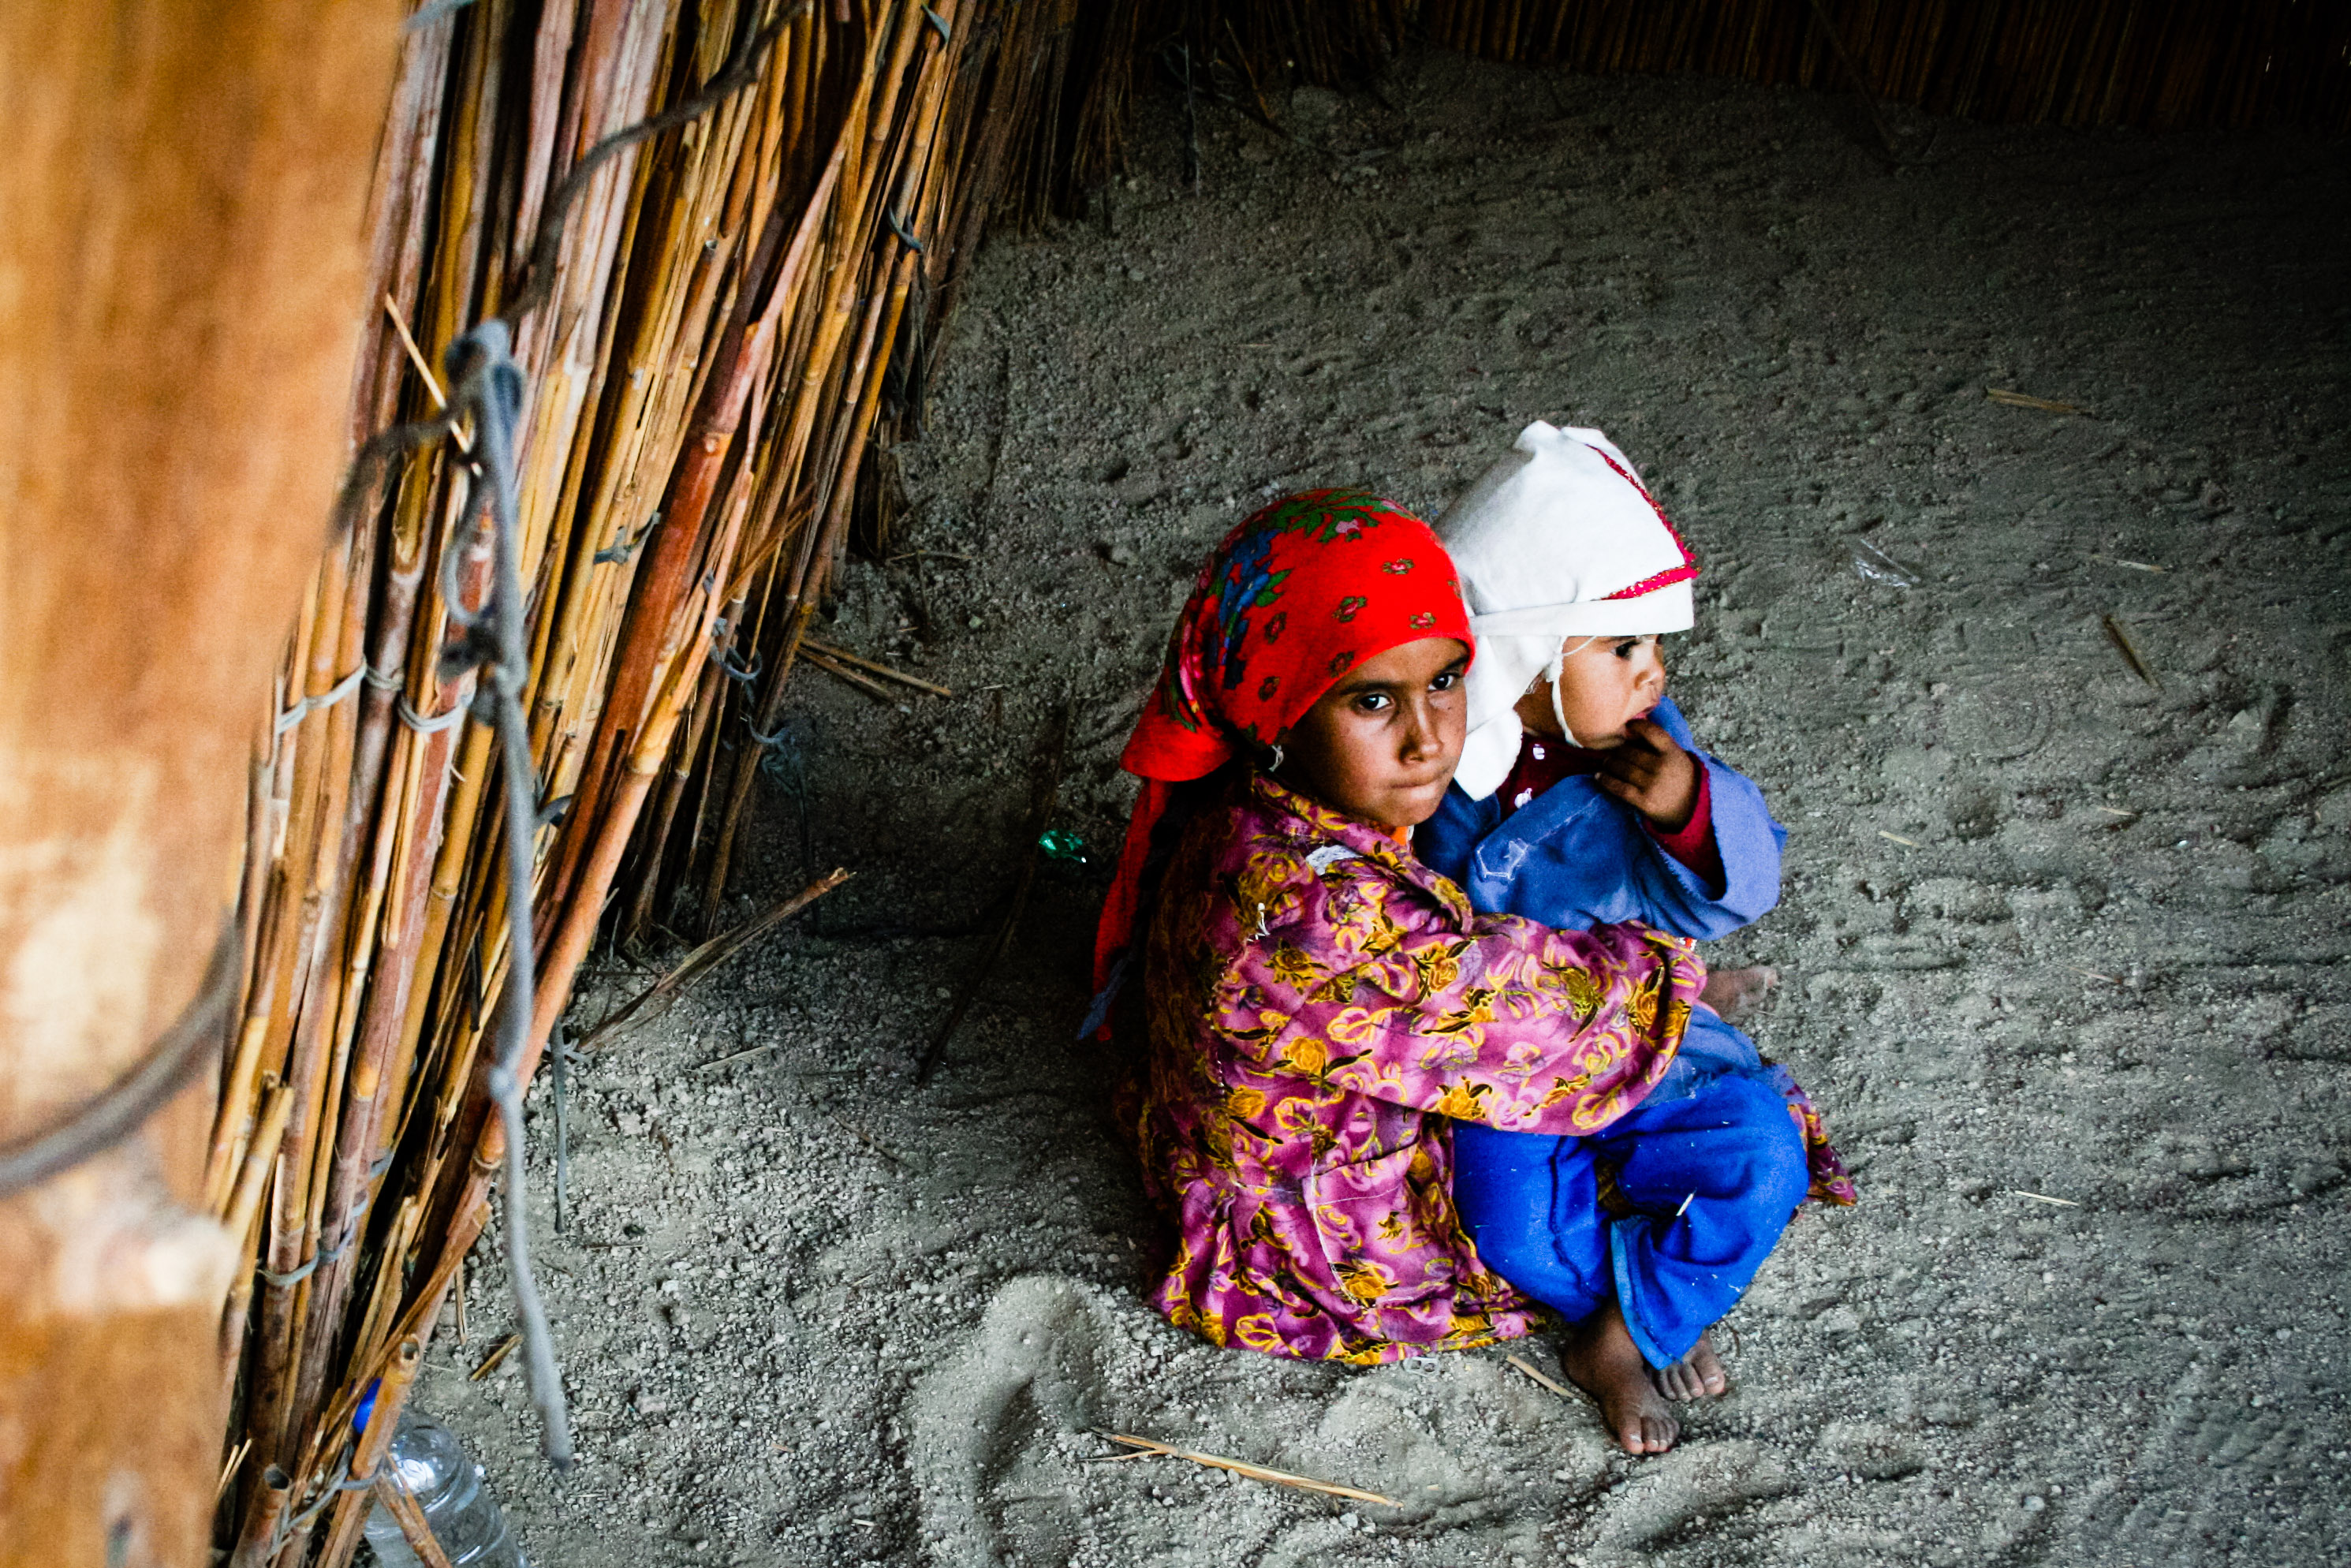 Two poor children, Africa, Kids, Sitting, Sad, HQ Photo